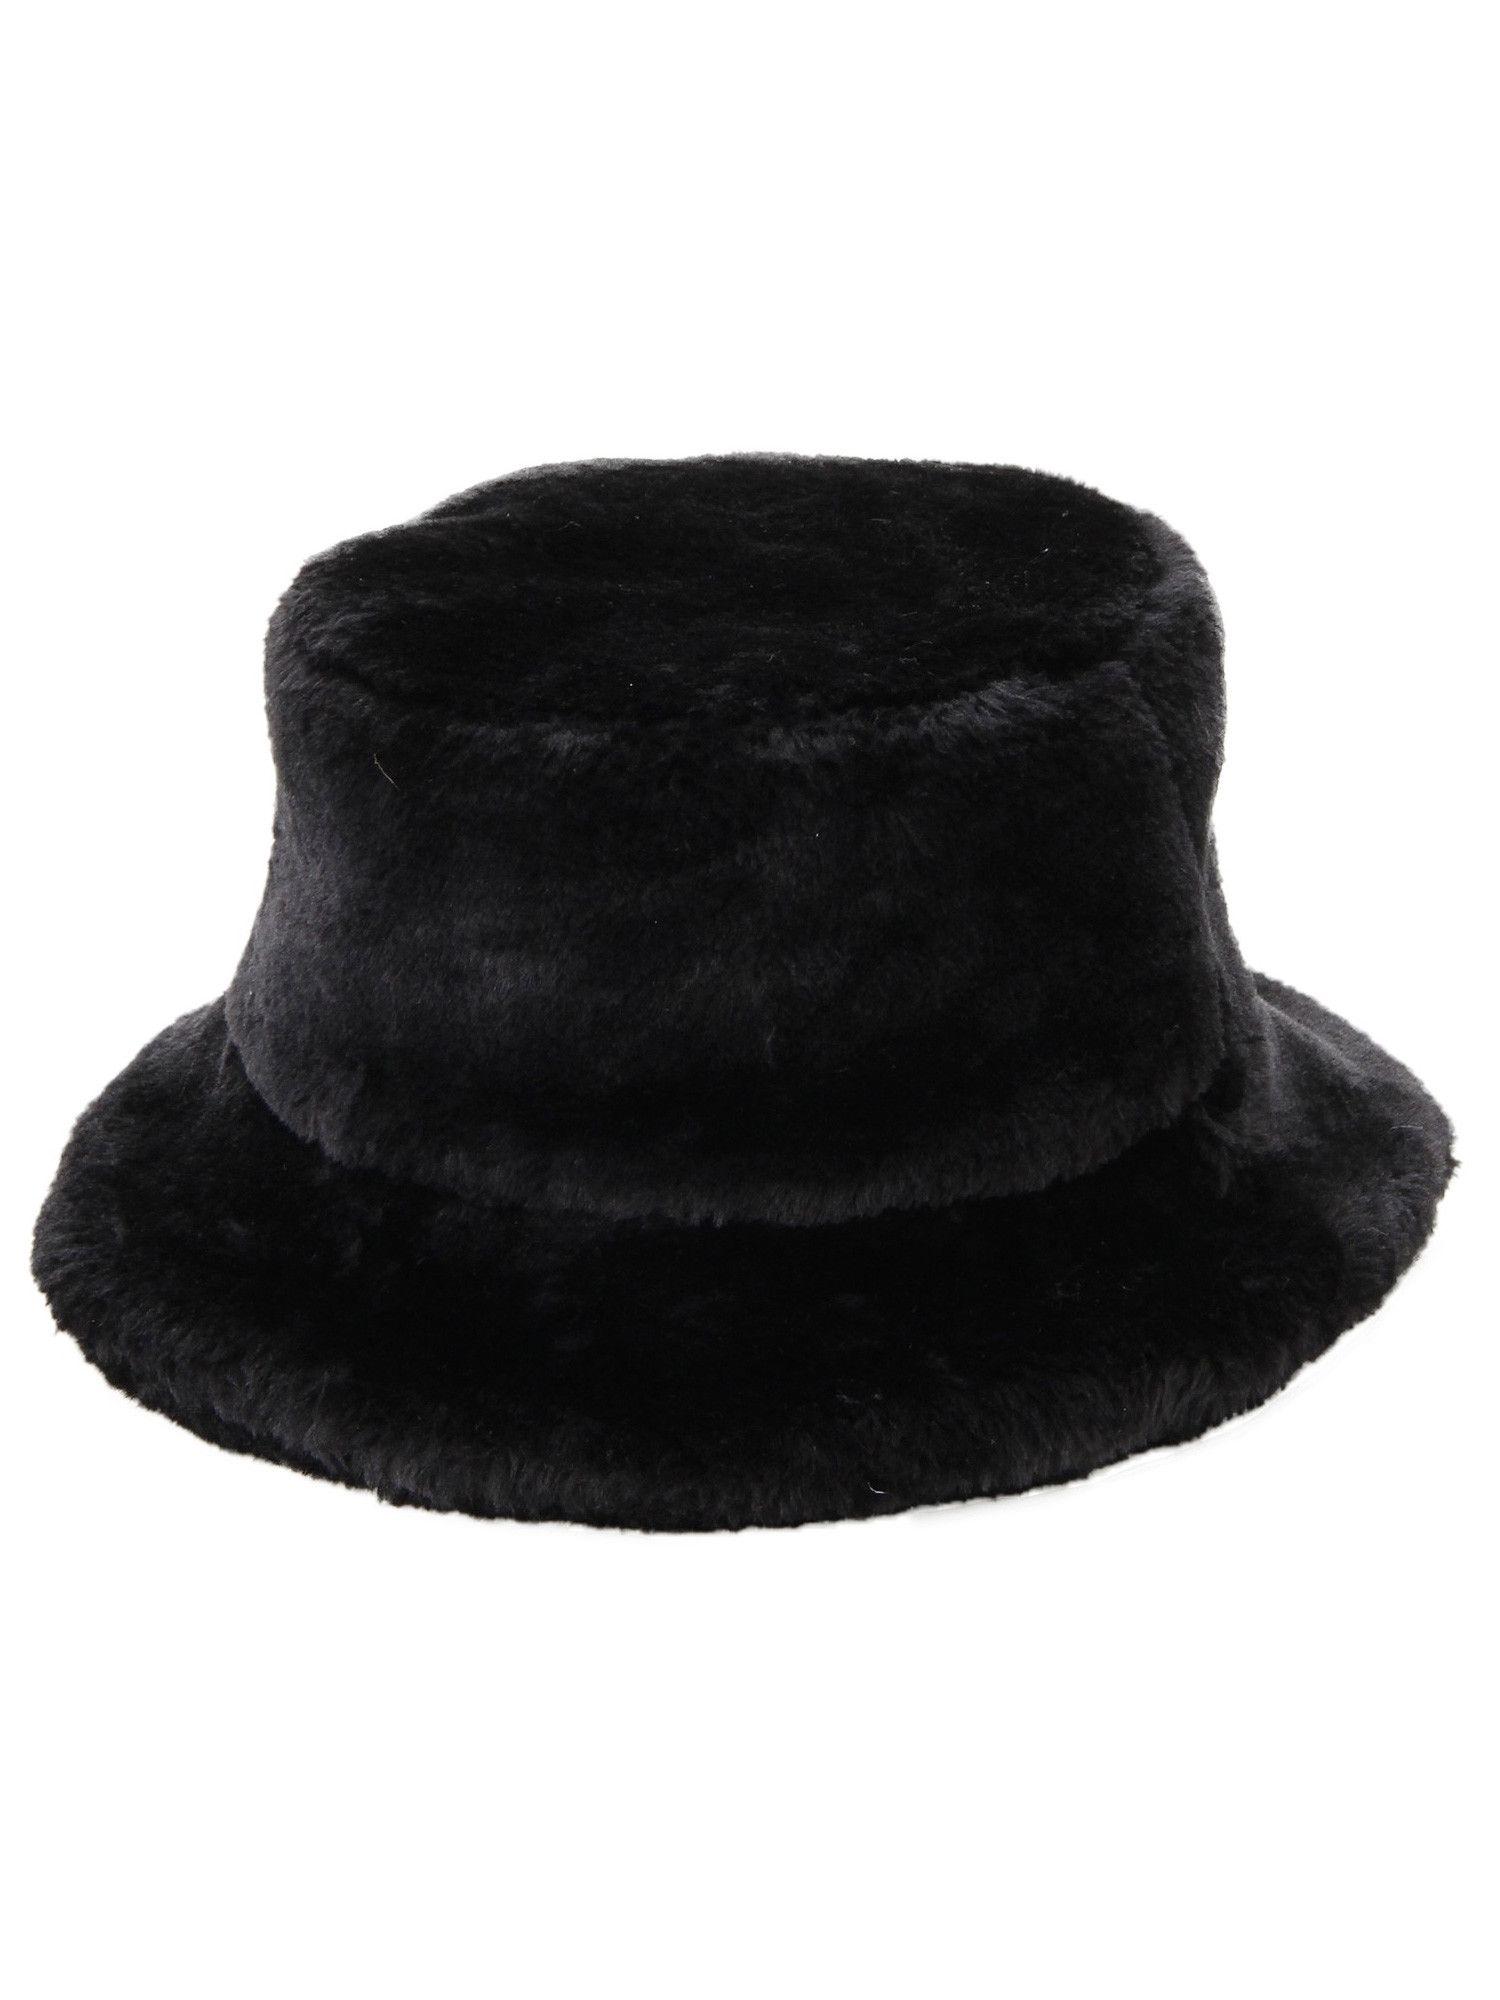 Eco-fur hat